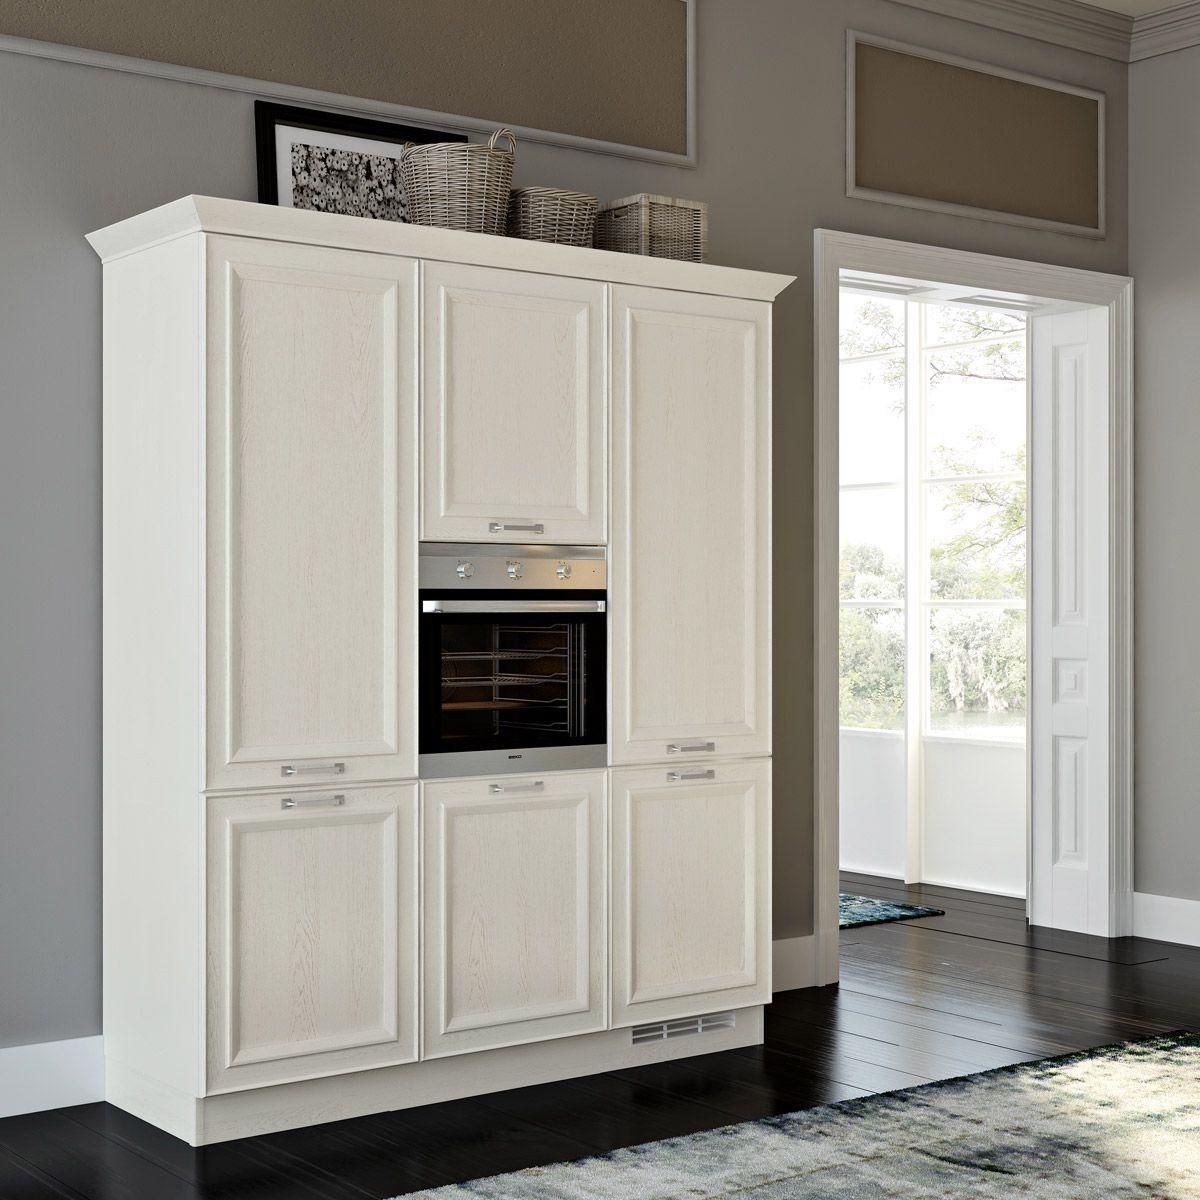 Cucina classica SARA di ekocucine.it - Anta telaio artico #kitchens ...